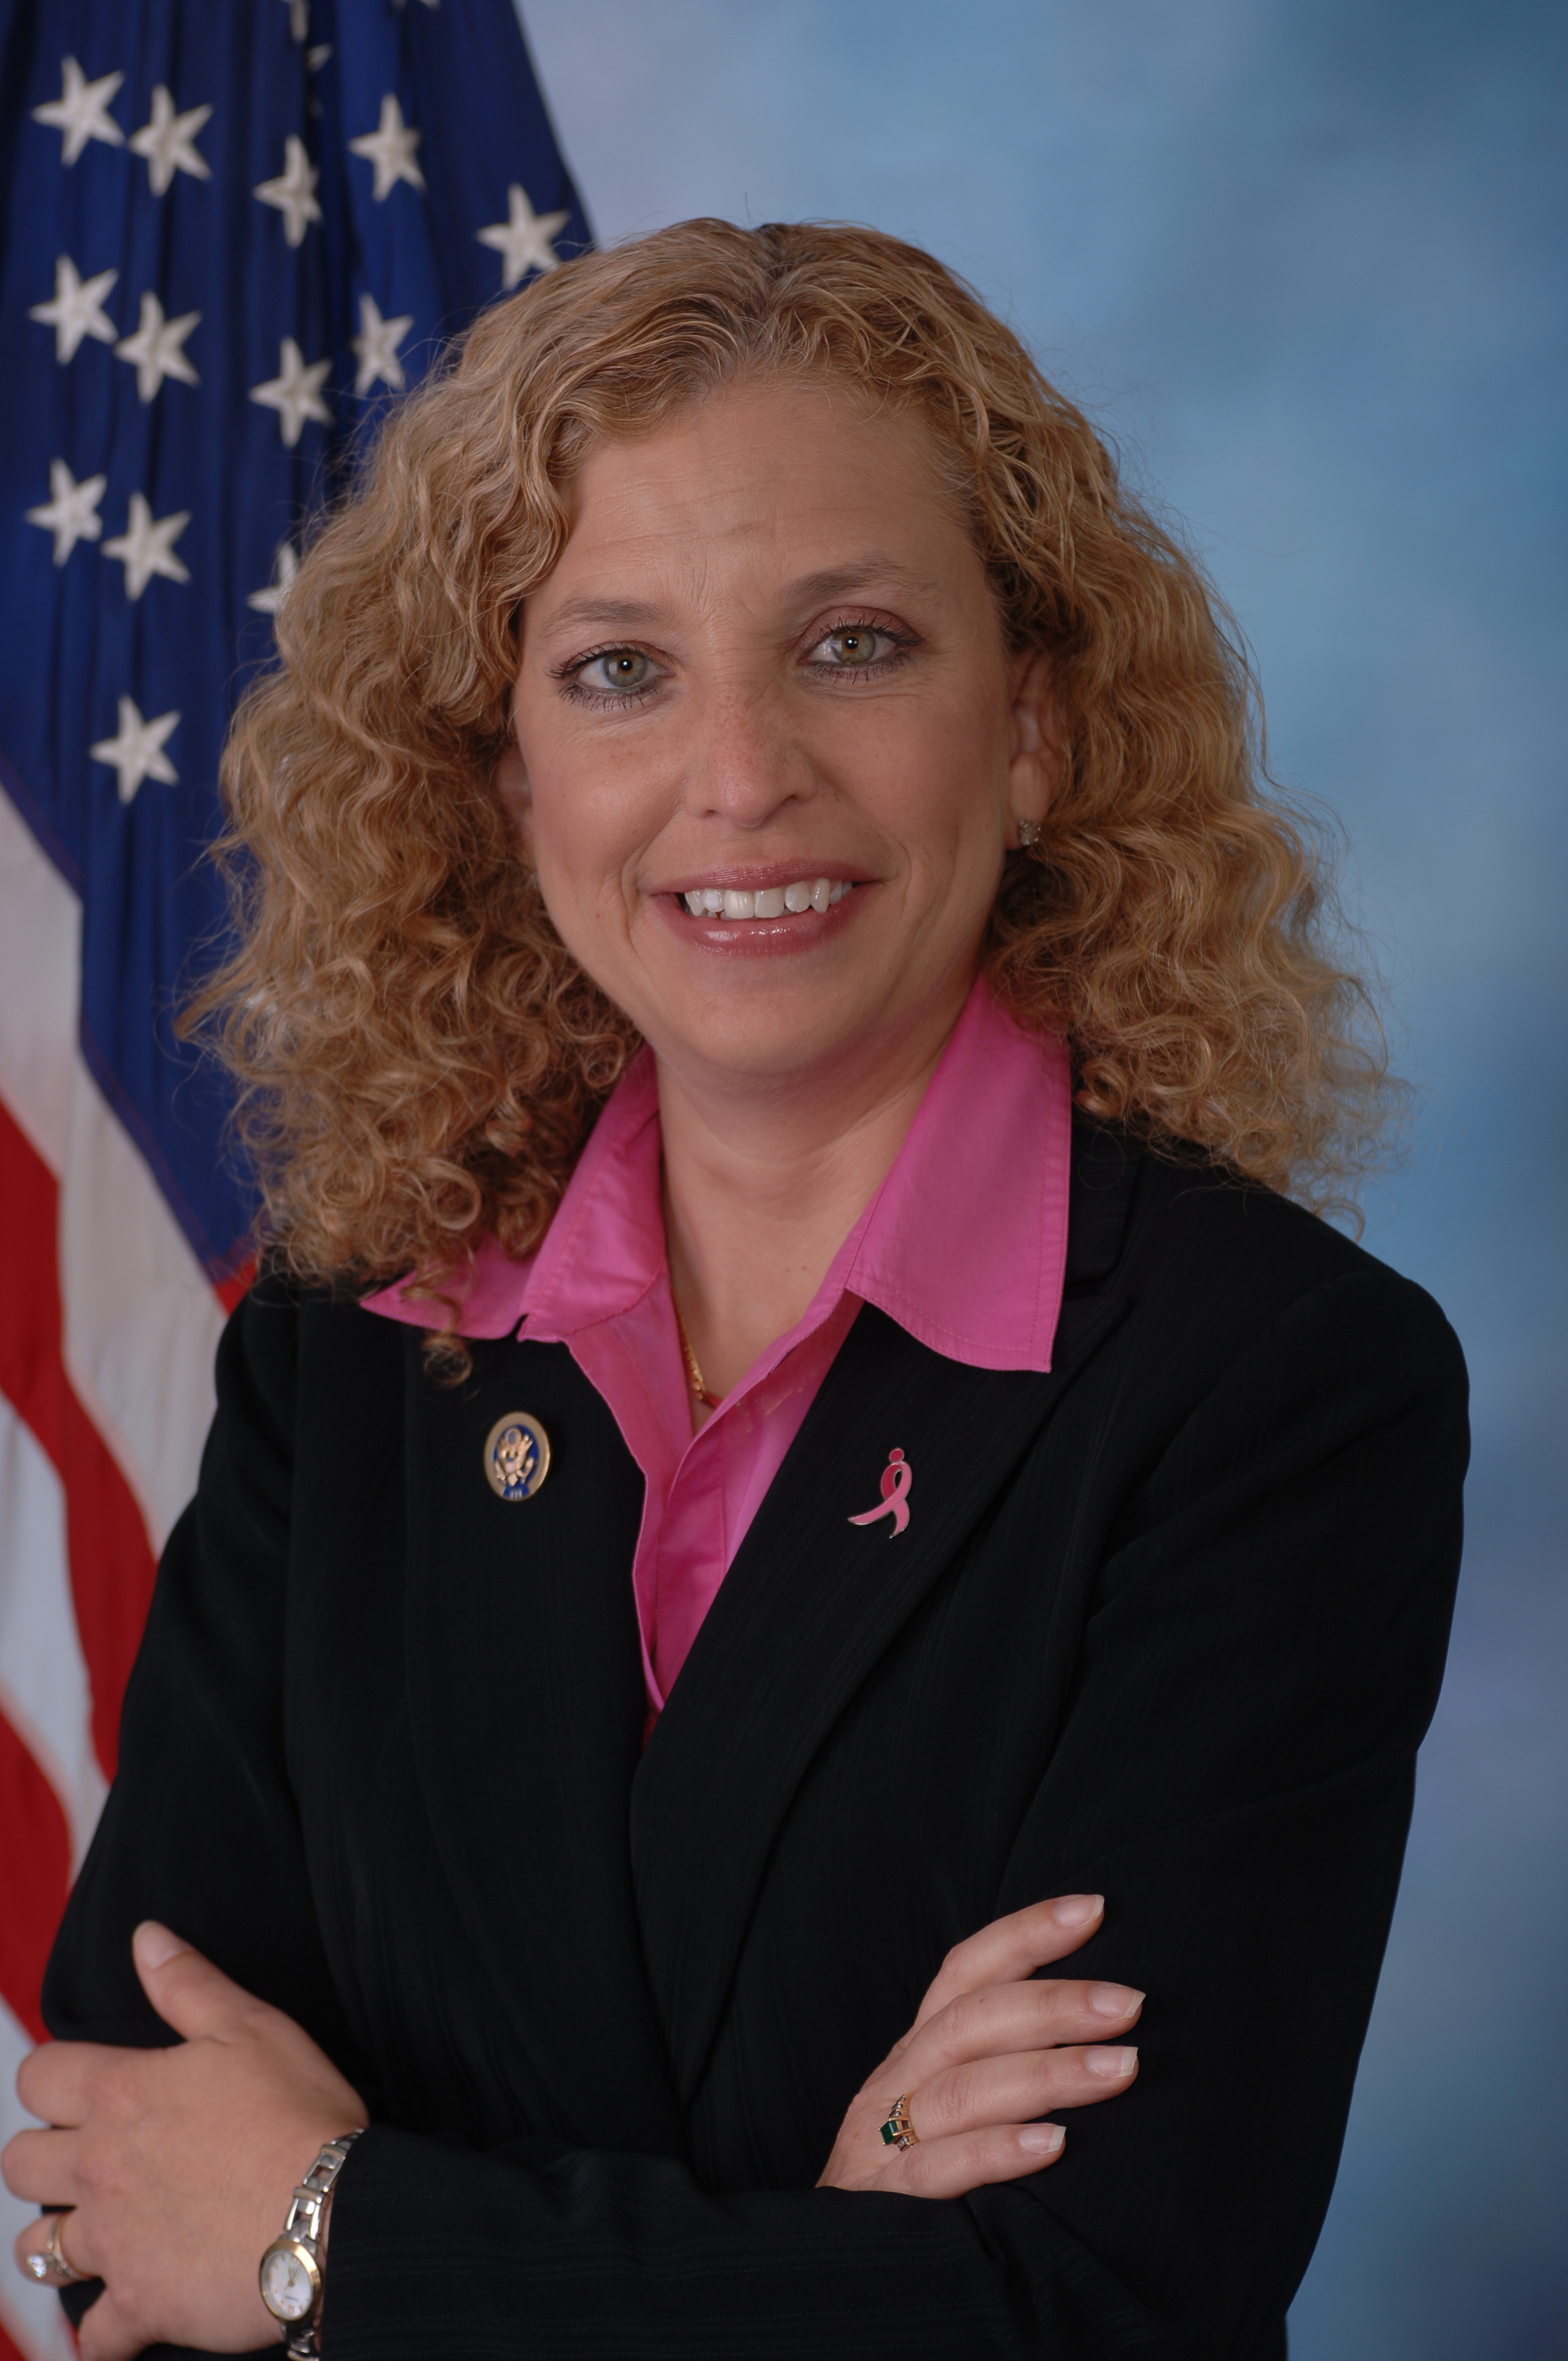 2013_05_Debbie_Wasserman_Schultz_official_portrait_112th_Congress